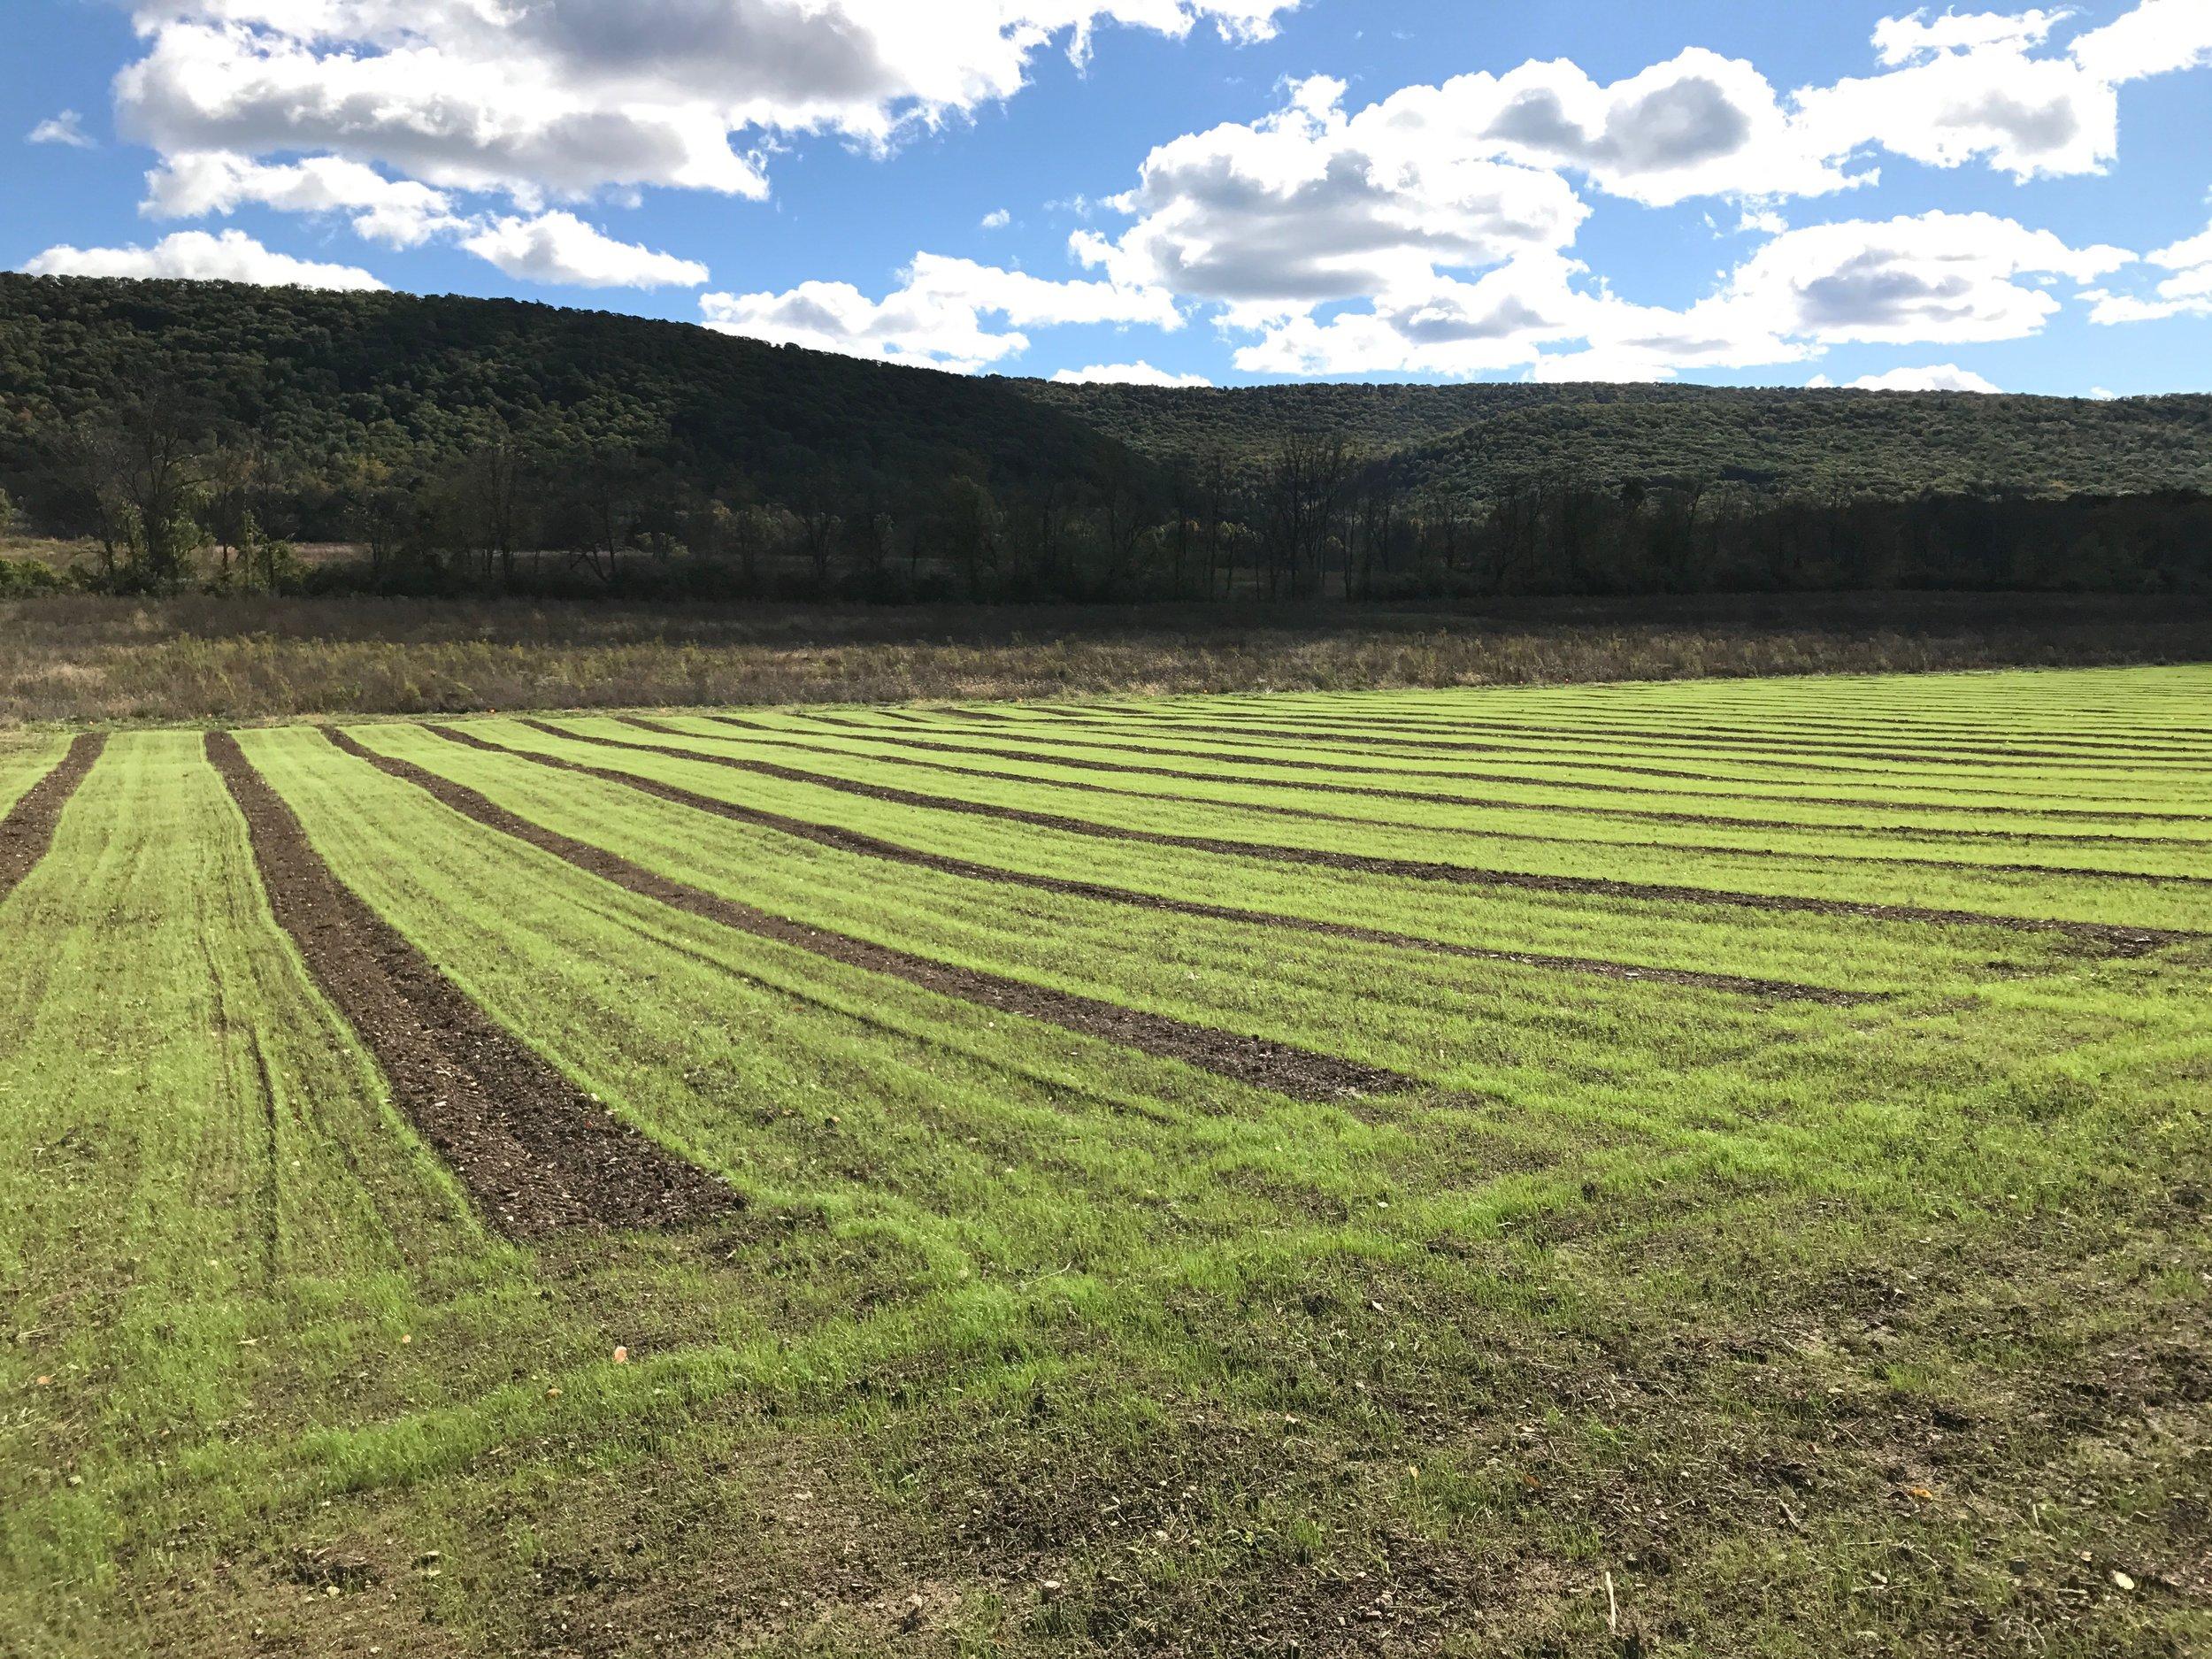 Vineyard grass planted.